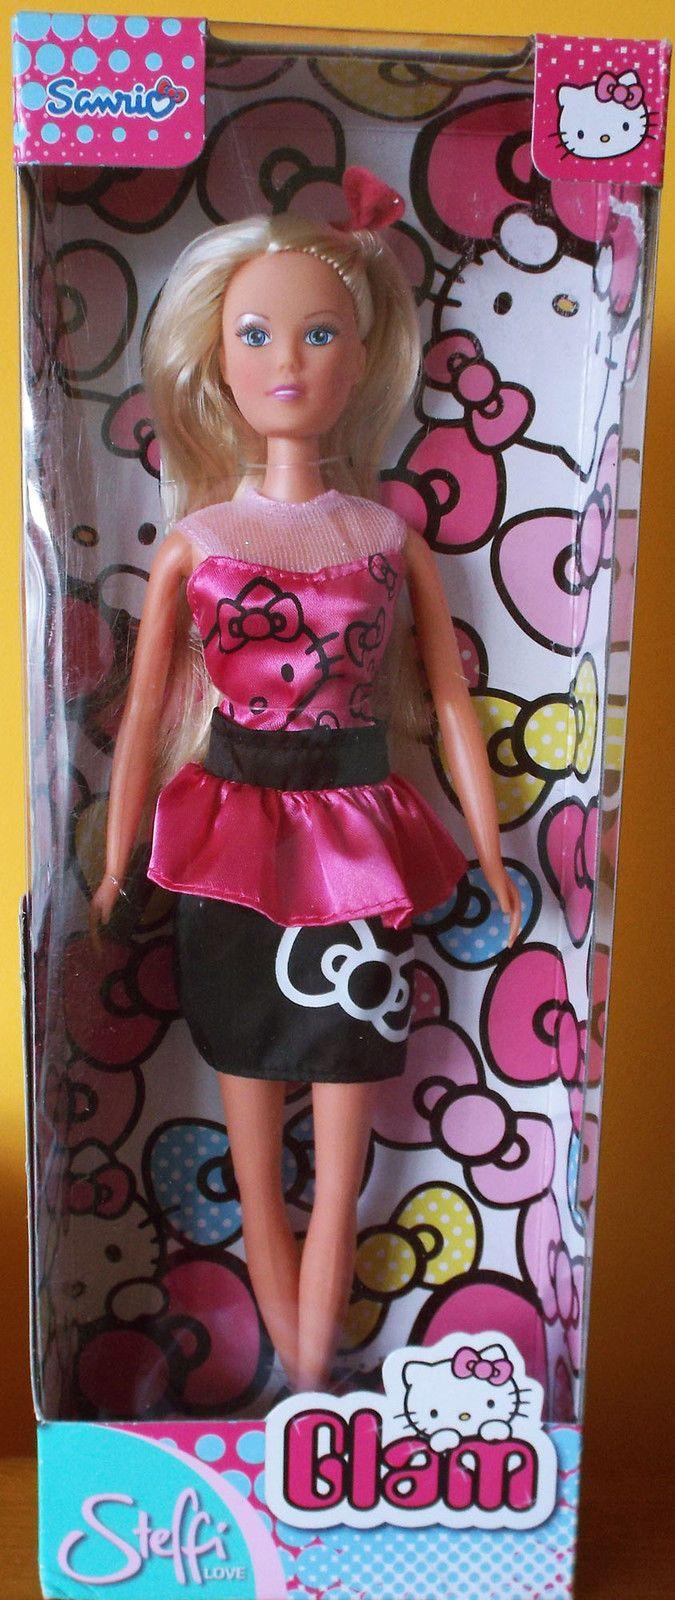 Sanrio Hello Kitty Glam Steffi Love Doll by Simba Toys | eBay